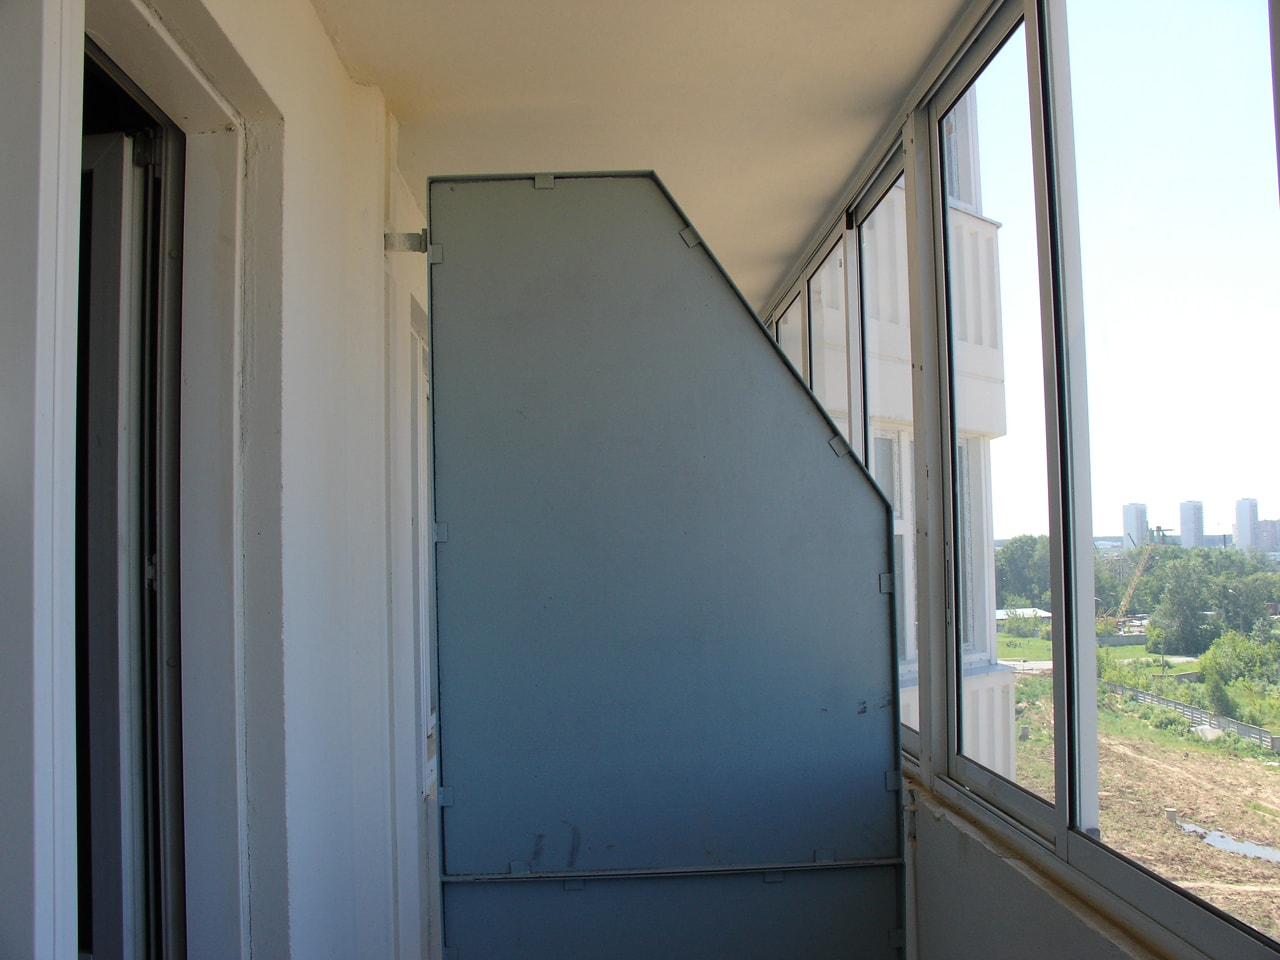 Сделать перегородку на балконе.